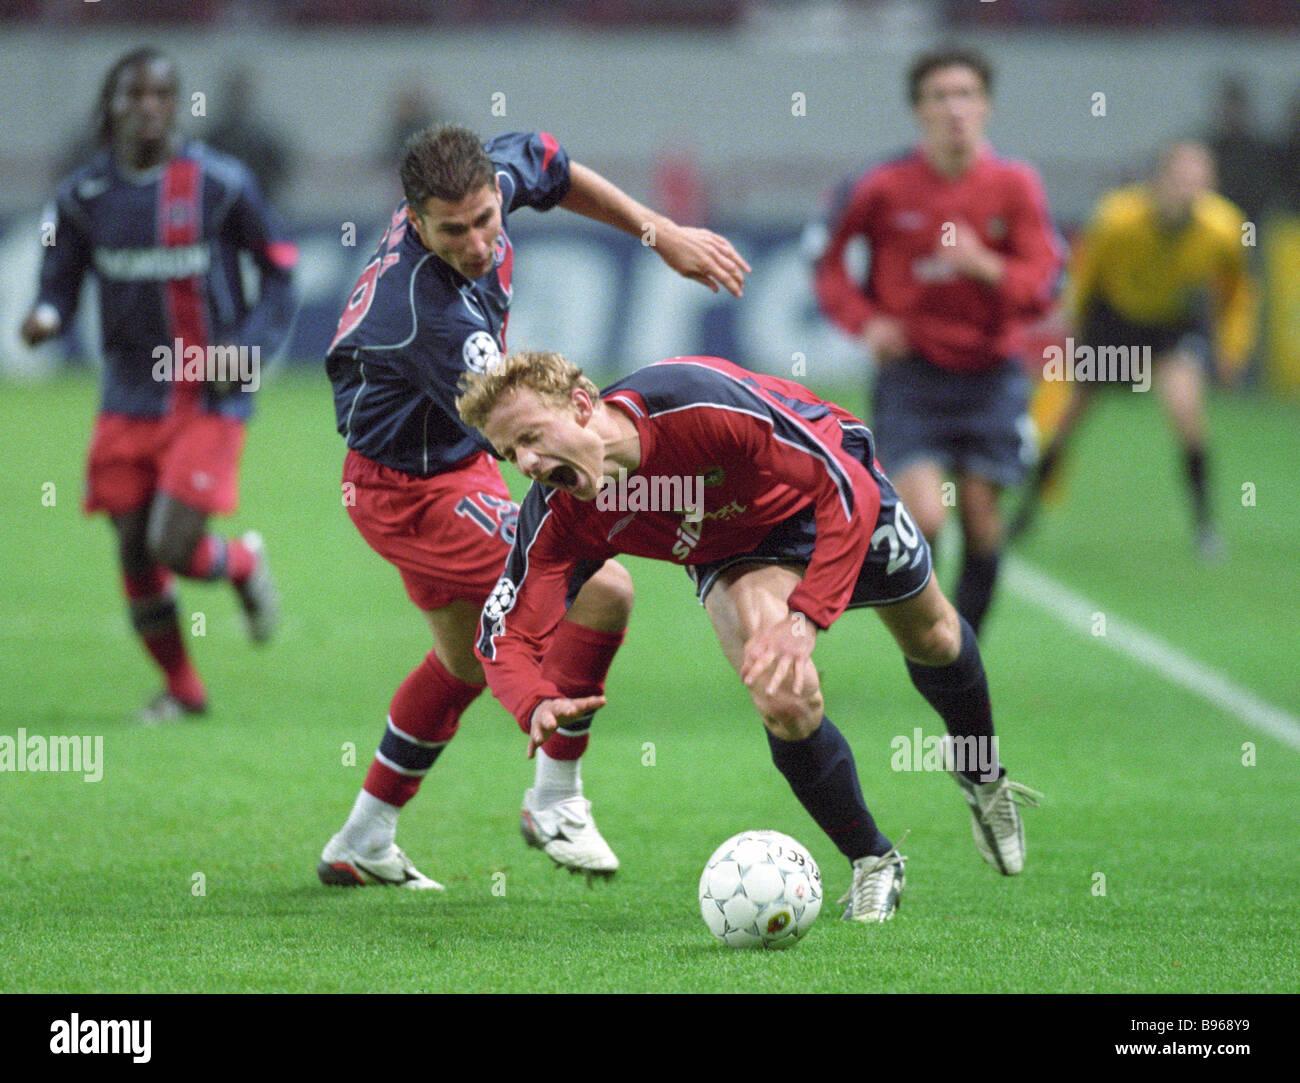 Champion League soccer meet of TsSKA red jerseys and Paris Saint Germain Jarosik TsSKA No 20 has the ball - Stock Image